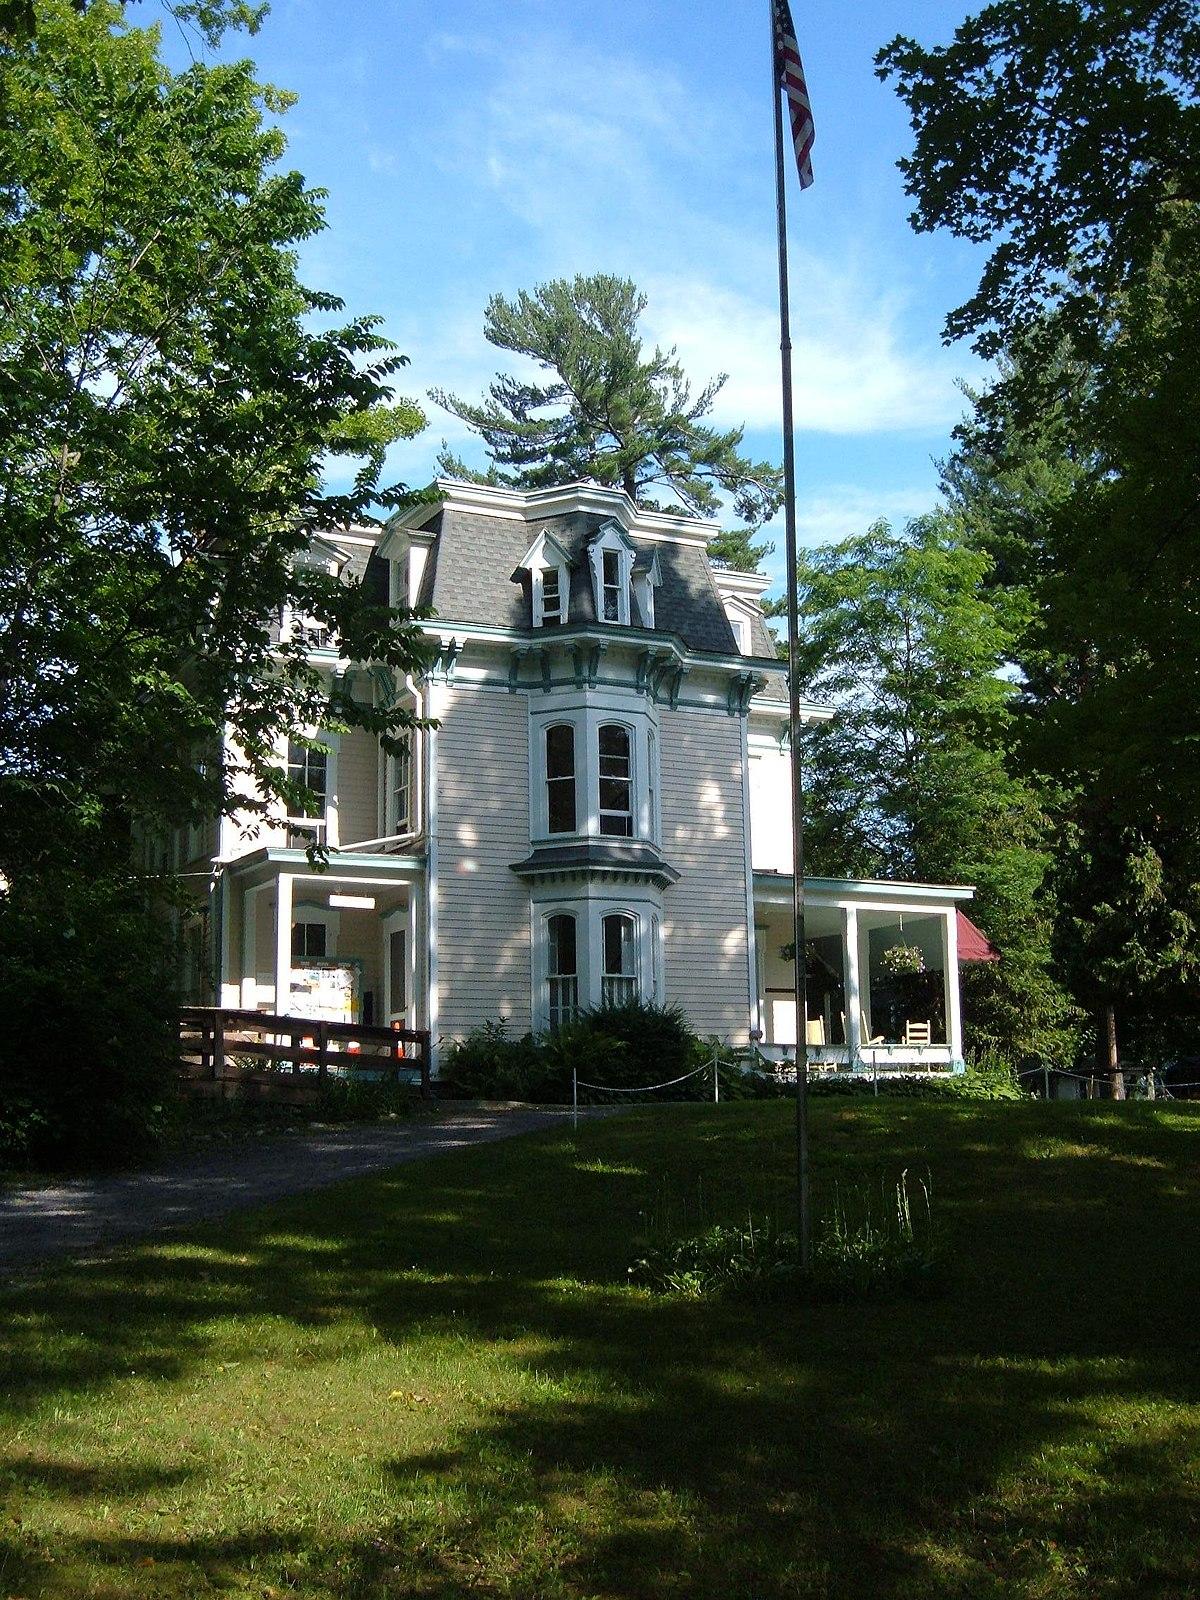 Wiawaka Holiday House - Wikipedia